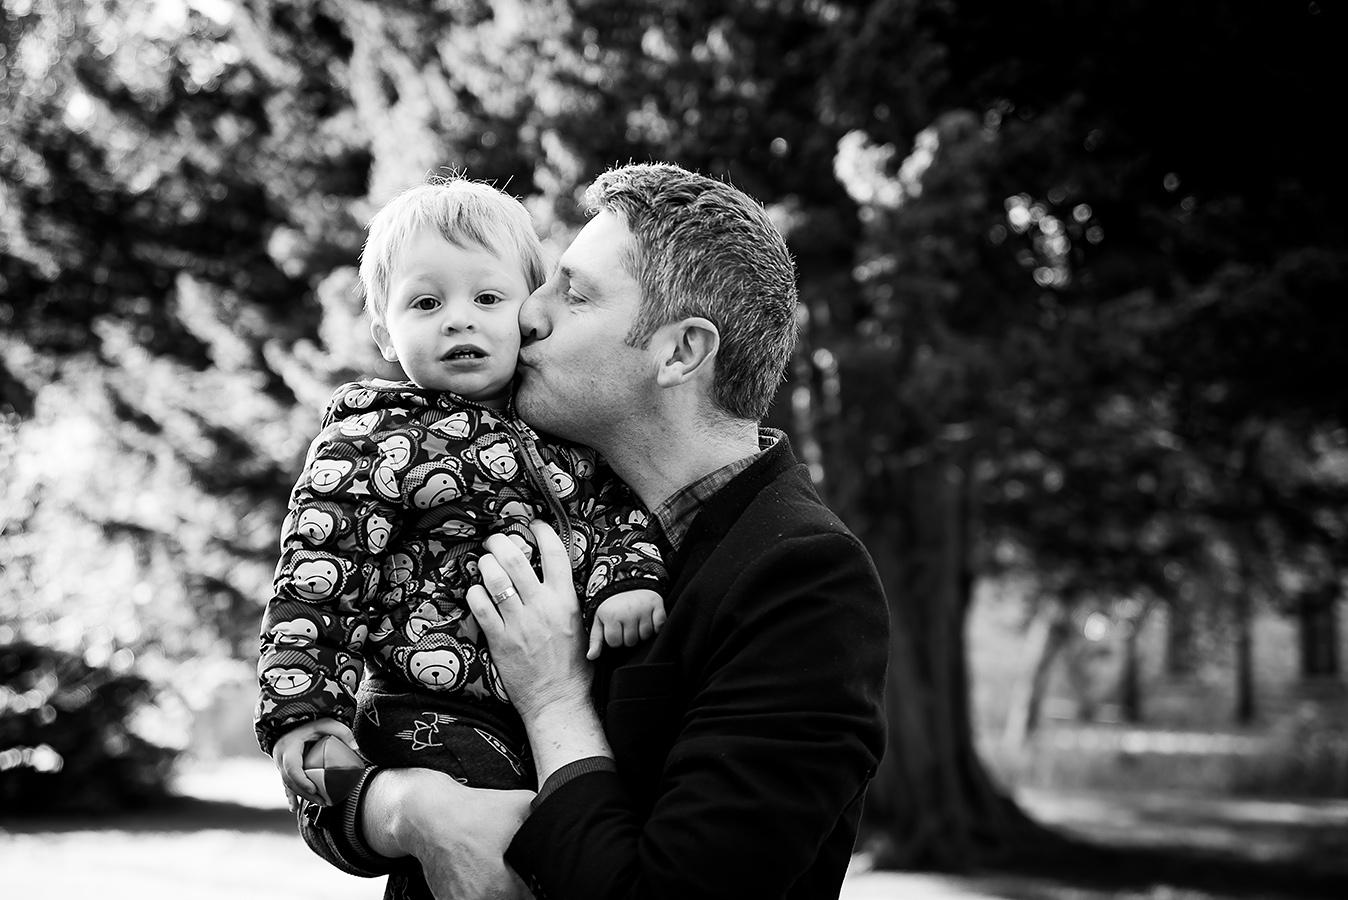 Dad kissing son - Family Photoshoot at Marlay Park in Dublin by Camila Lee